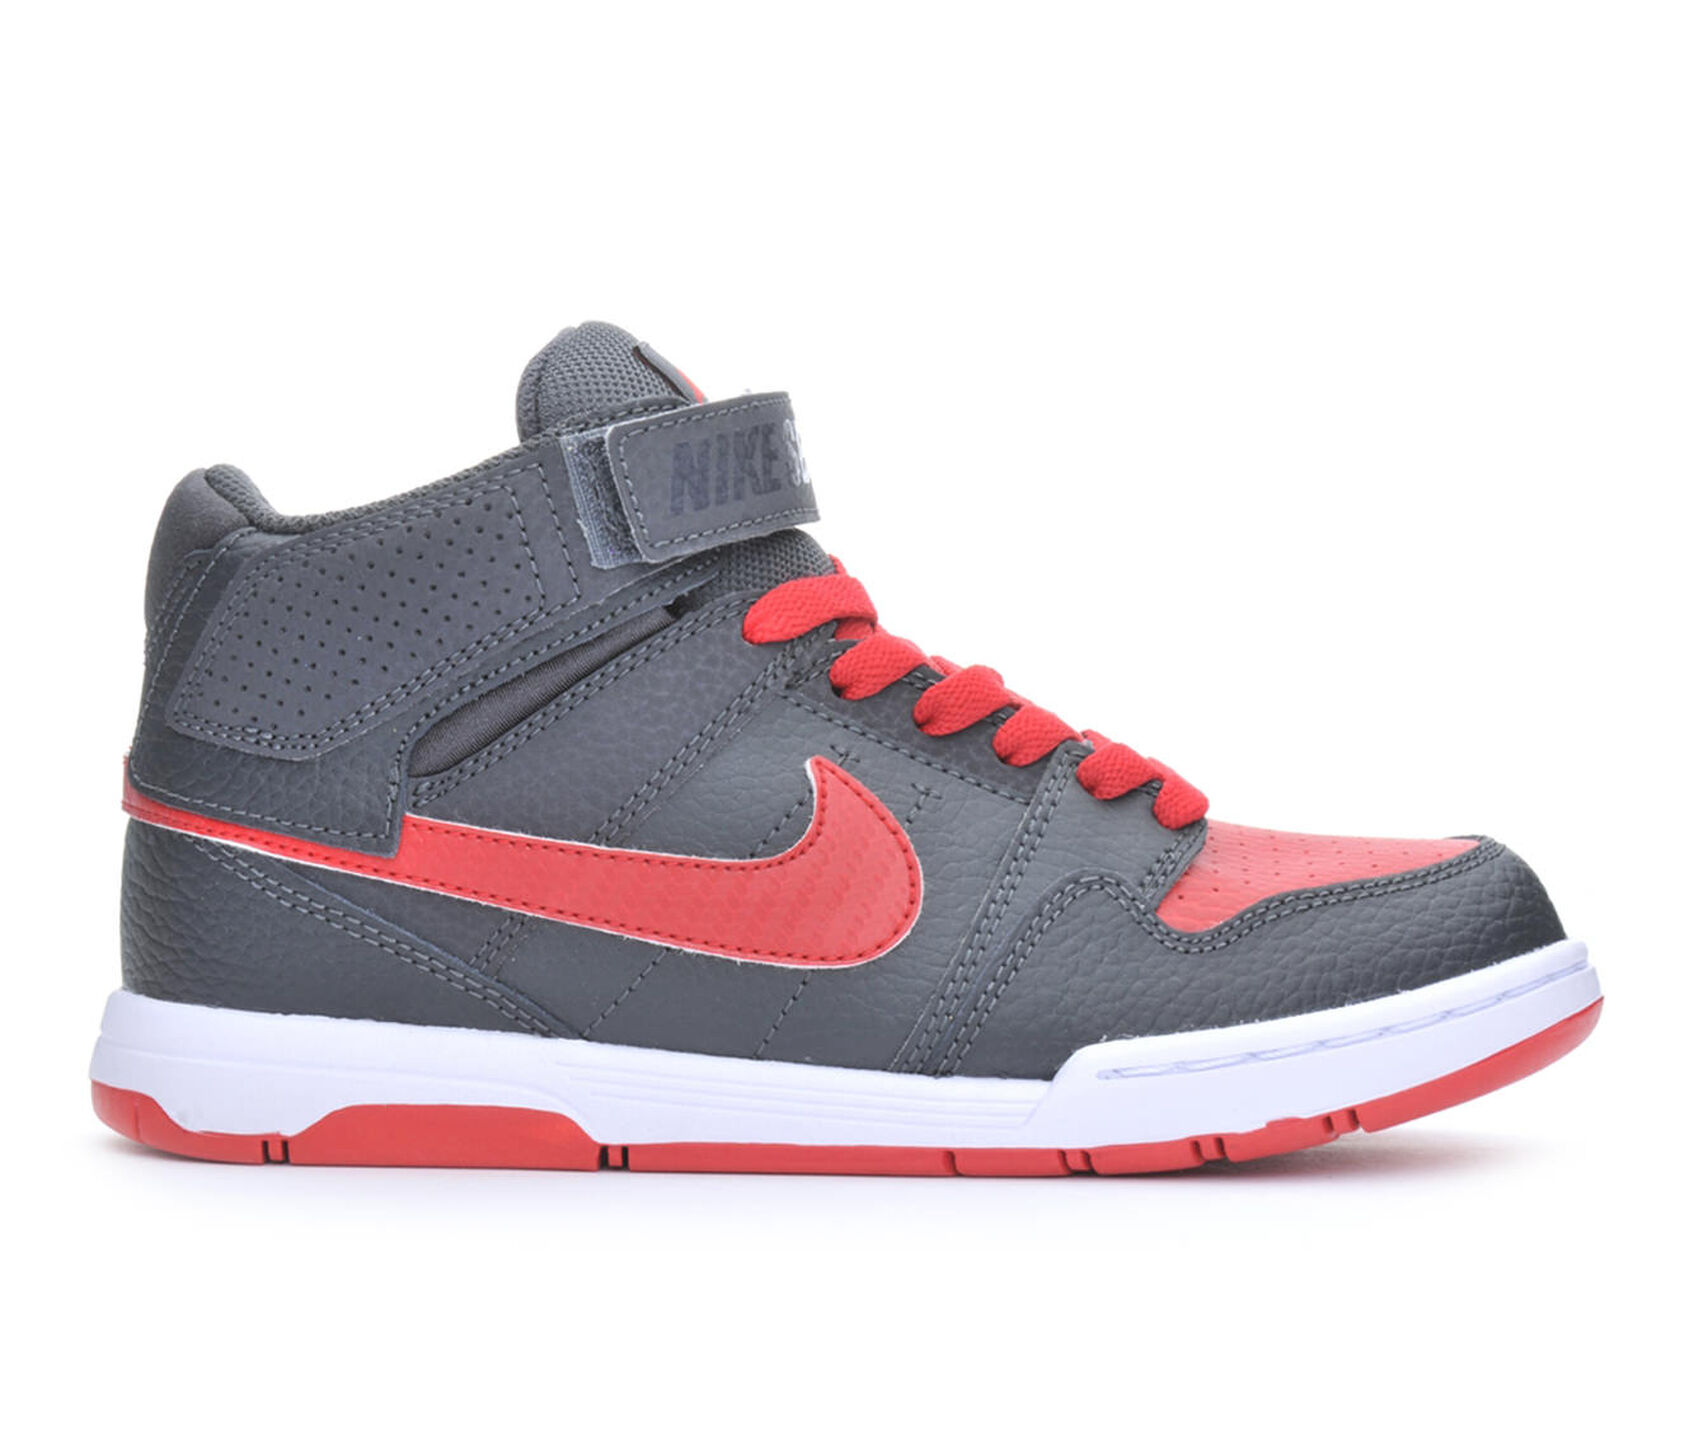 1fad154aab886b Boys Nike Mogan Mid 2 Jr High Top Skate Shoes ...